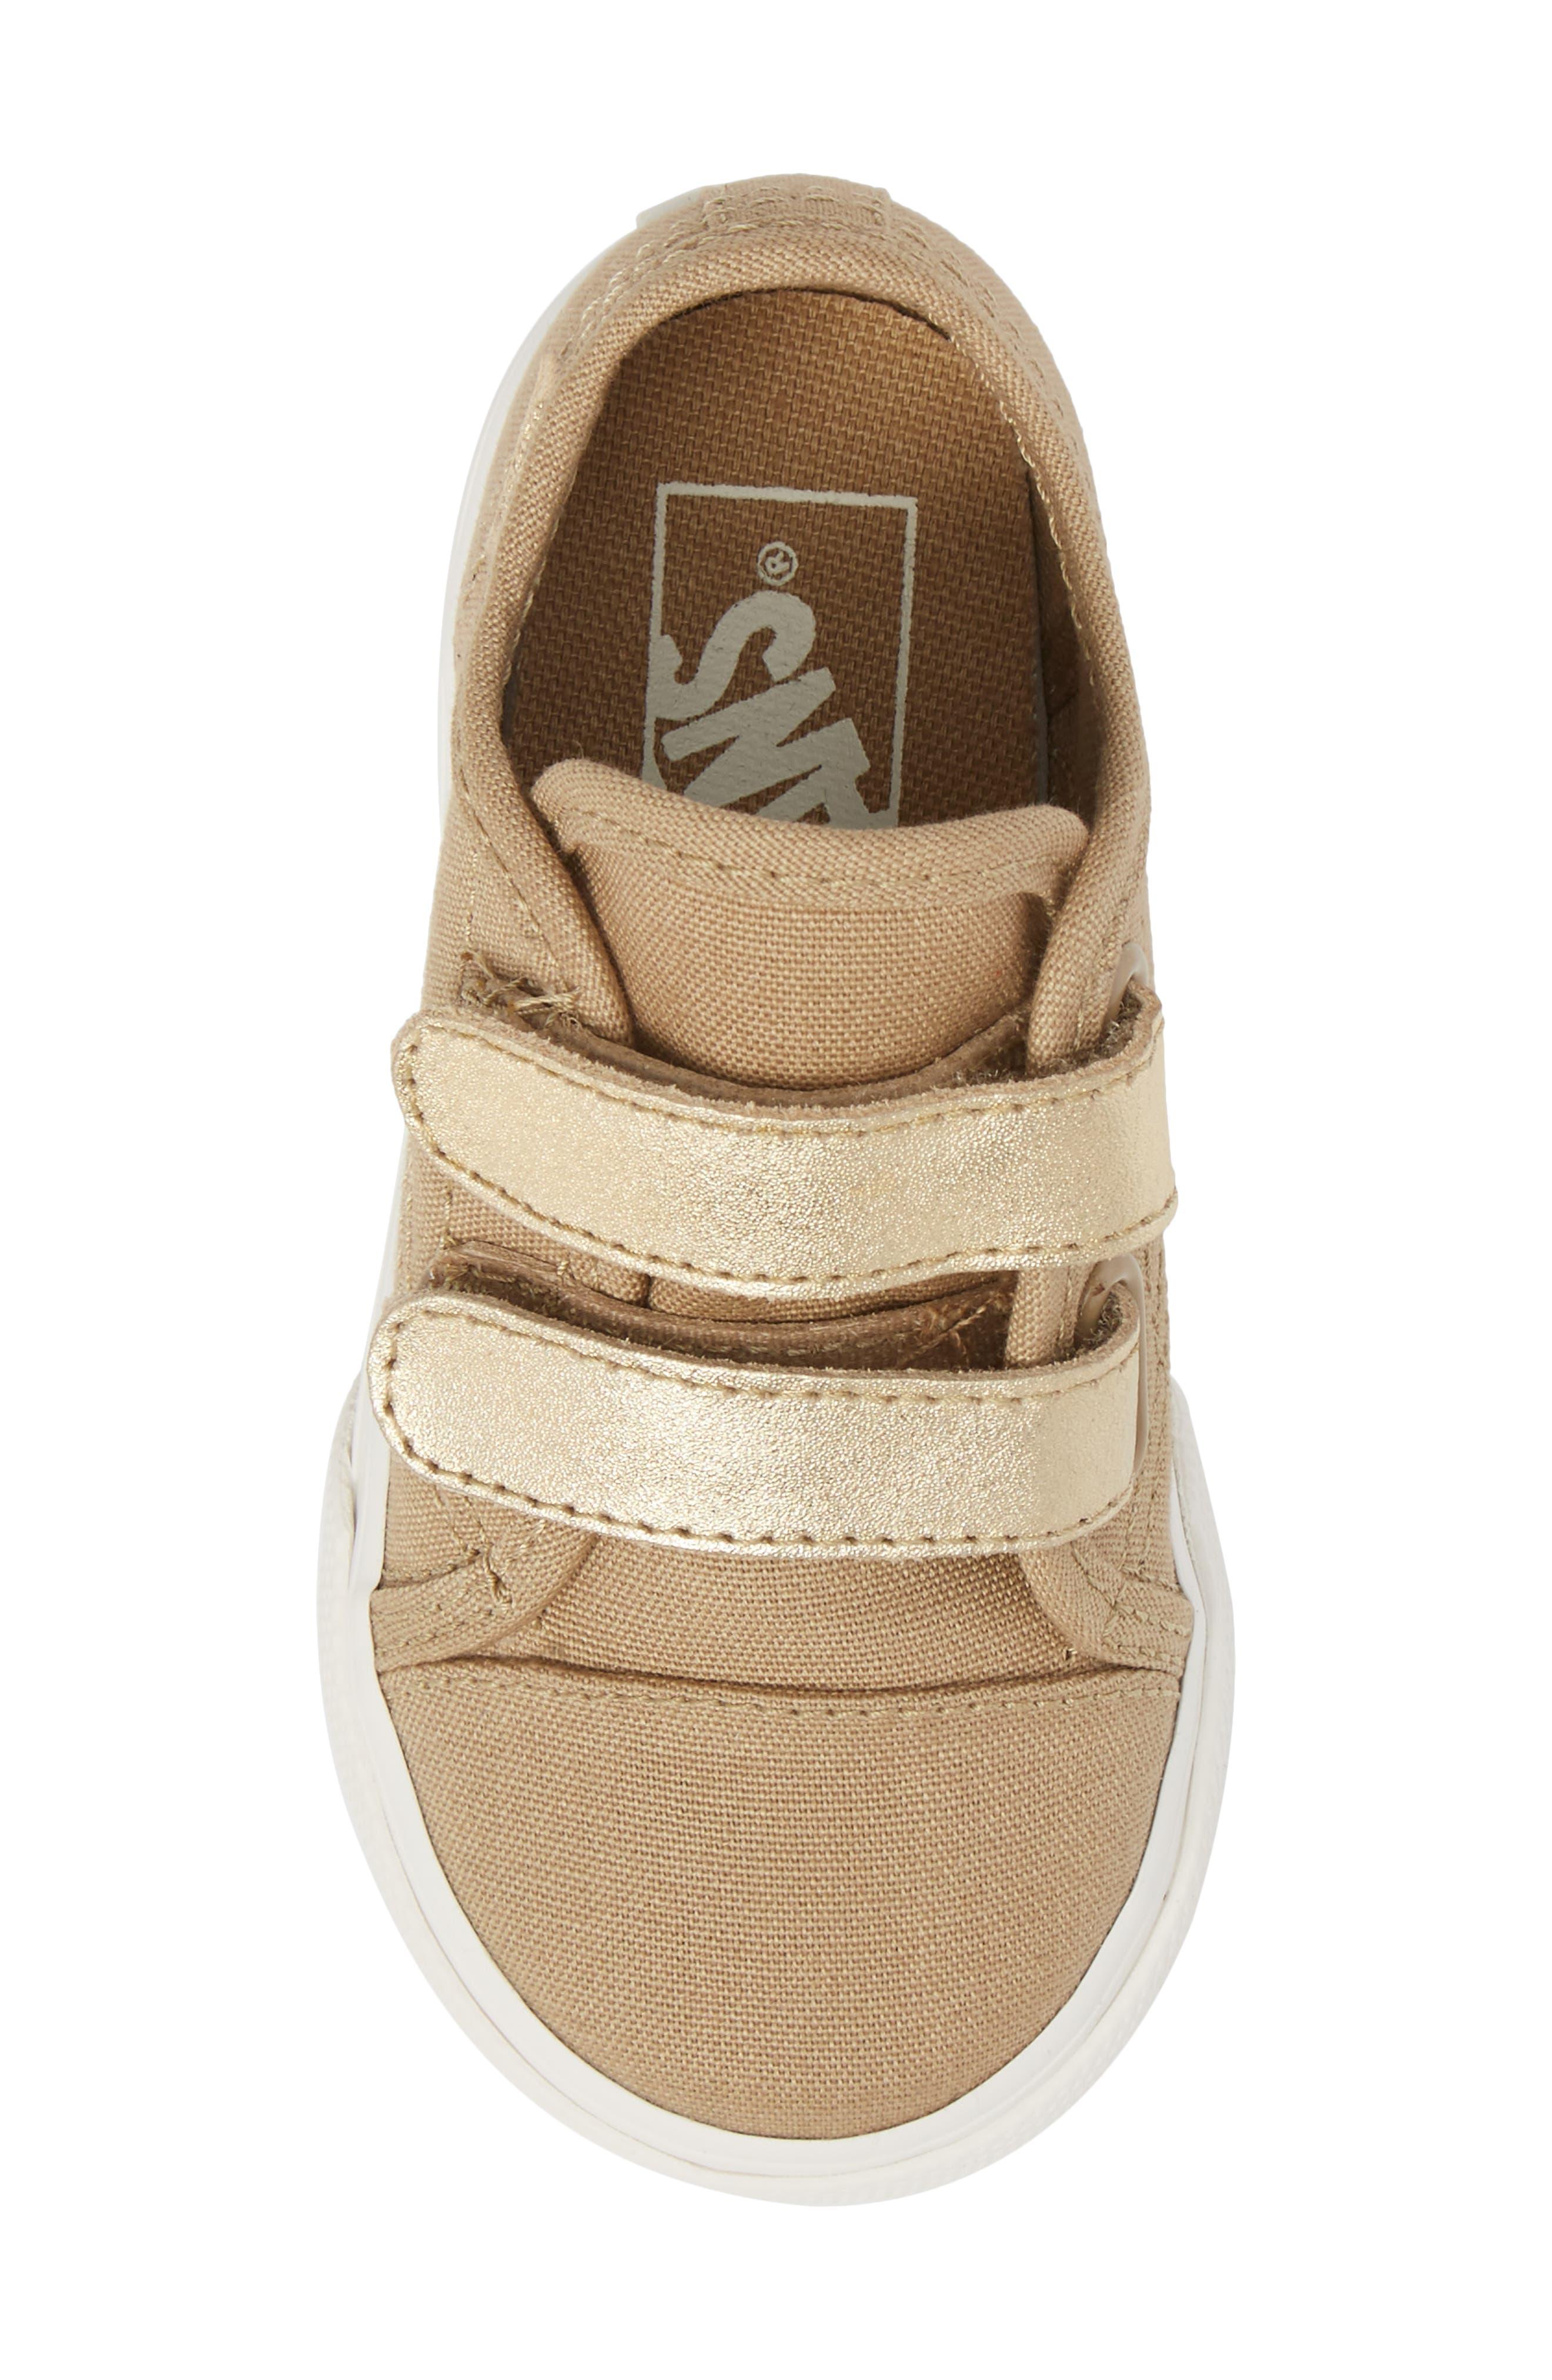 Style 23 V Sneaker,                             Alternate thumbnail 5, color,                             Metallic/ Cornstalk